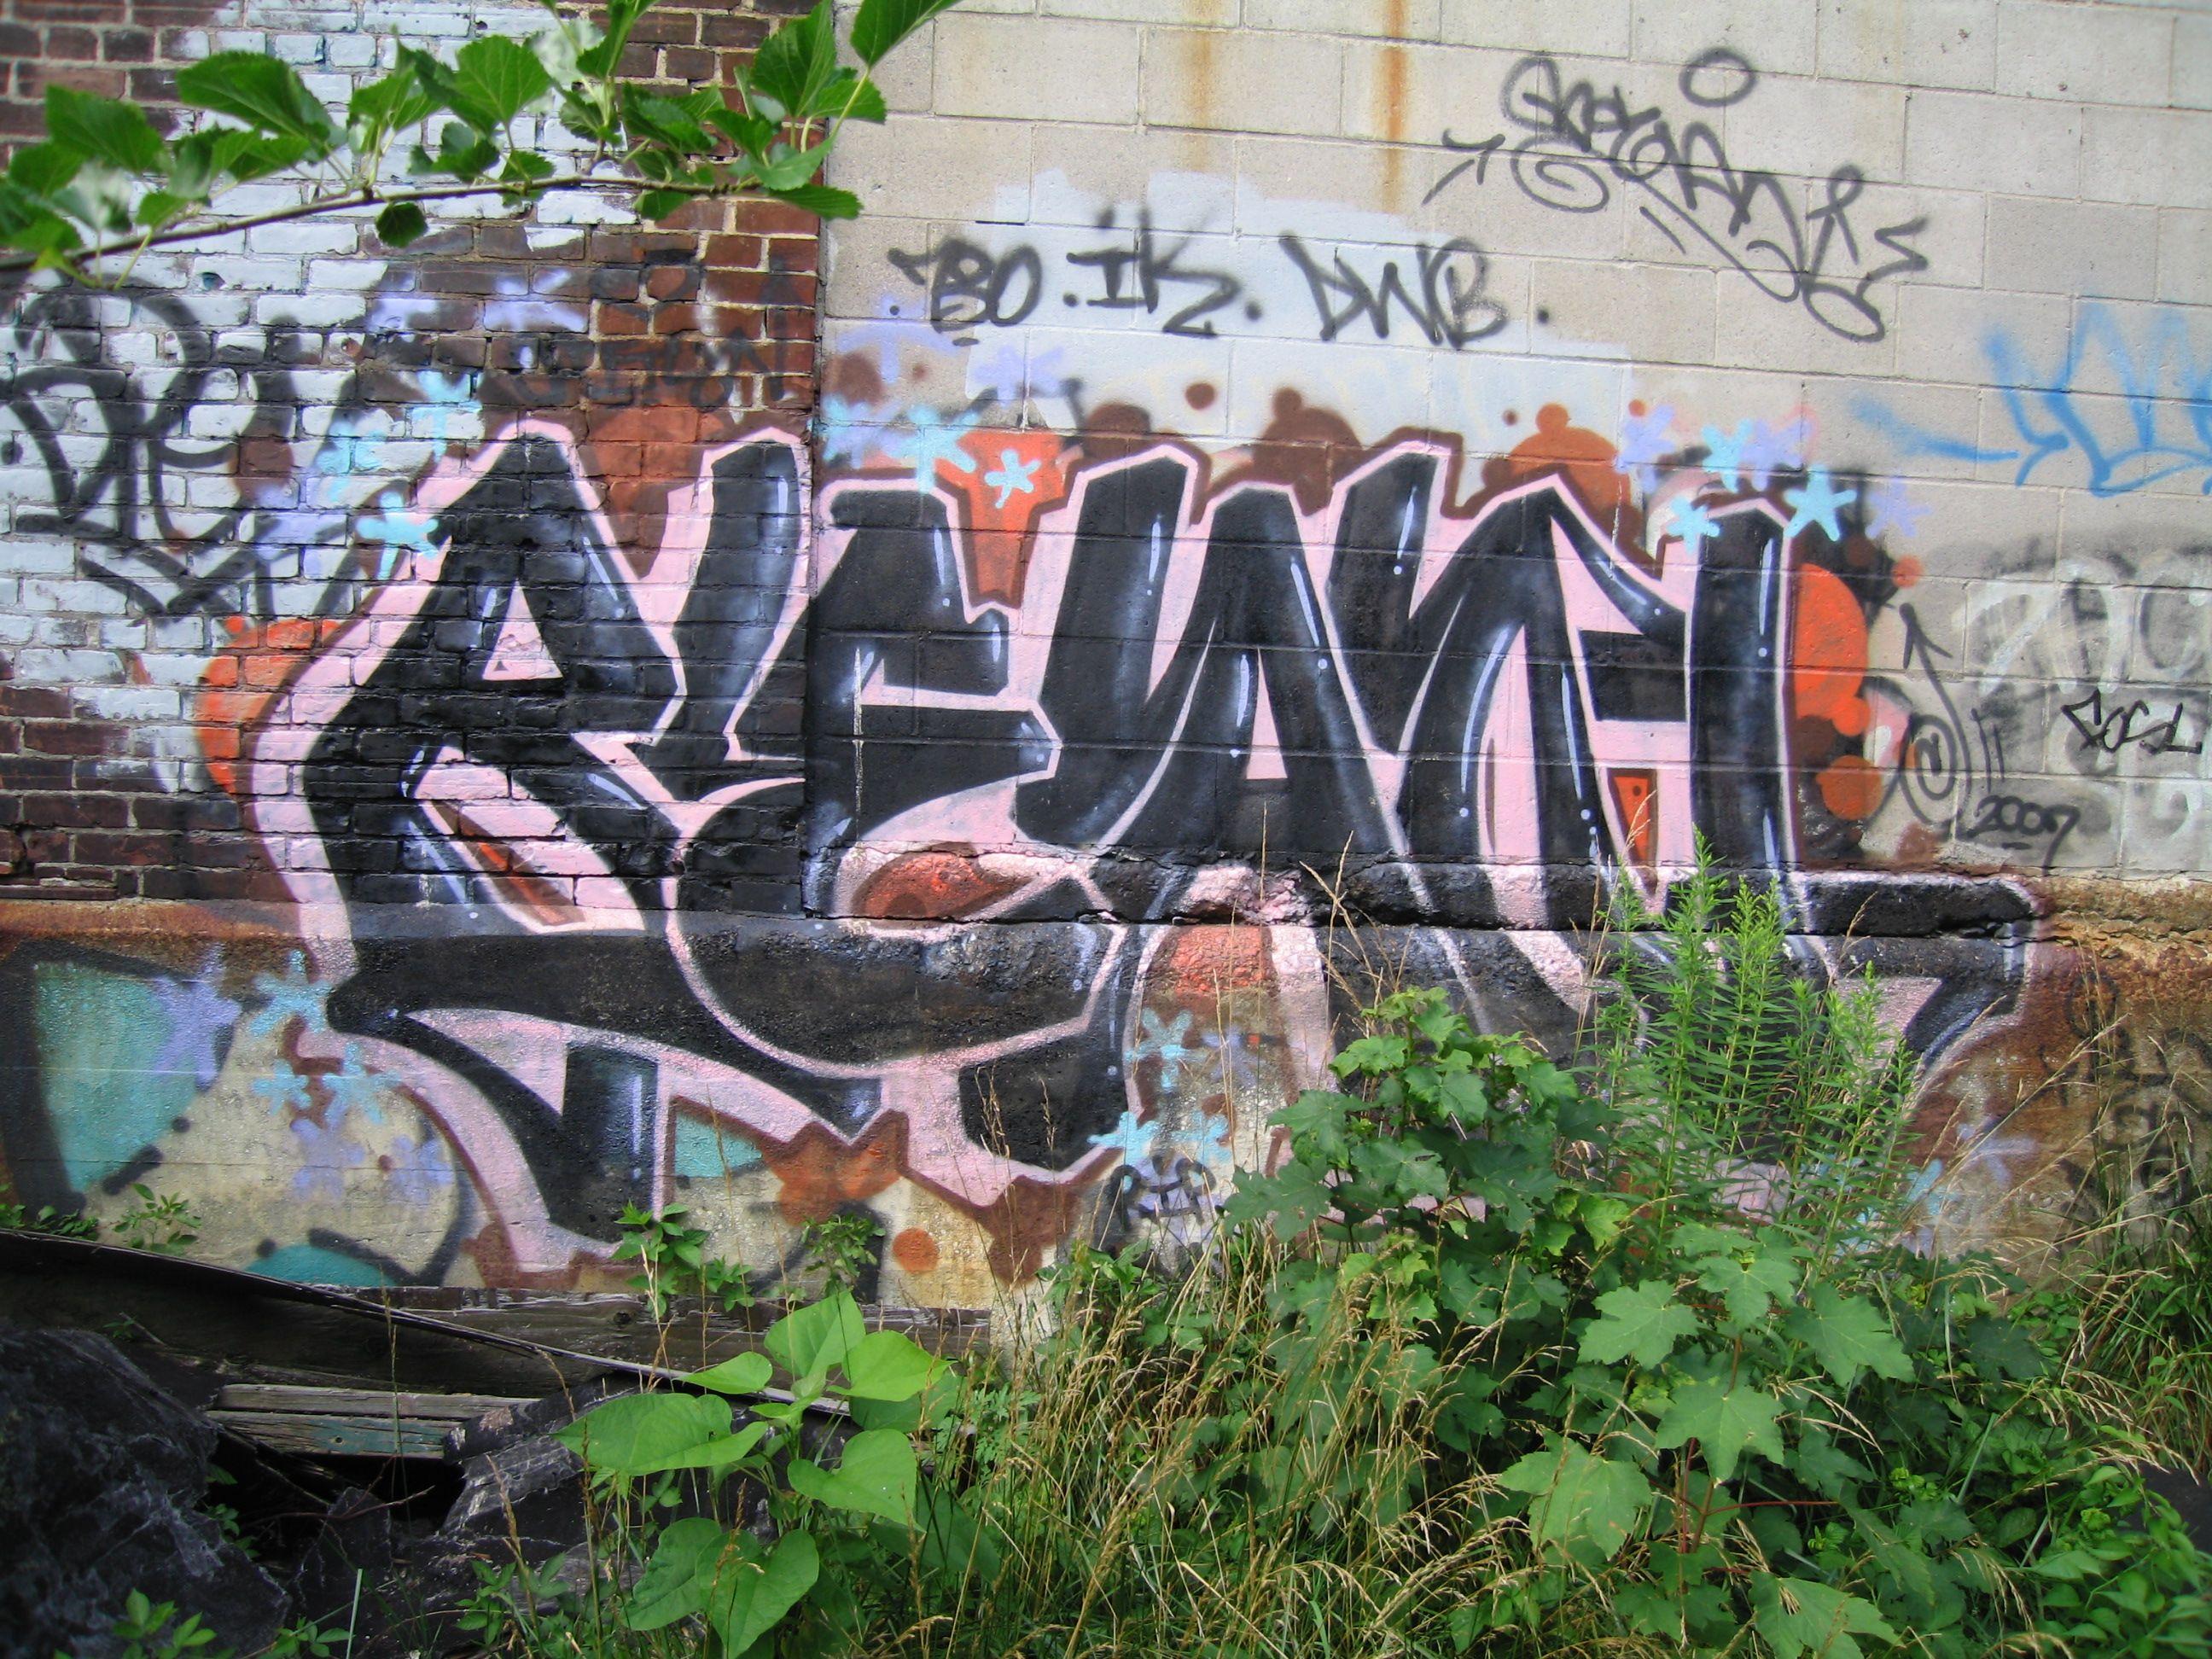 urbanartbomb #graffiti #bombing #graff #streetart - http://urbanartbomb.com/13367363-2/ -  - Urban Art Bomb